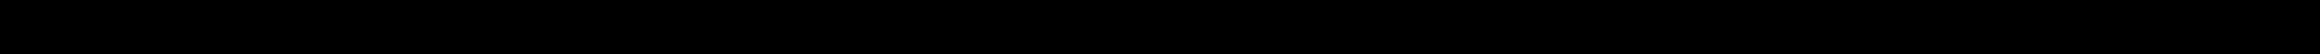 MAHLE ORIGINAL 68001297AA, K68001297AA, K68001297AA, 1118184, 12355851 Alyvos filtras